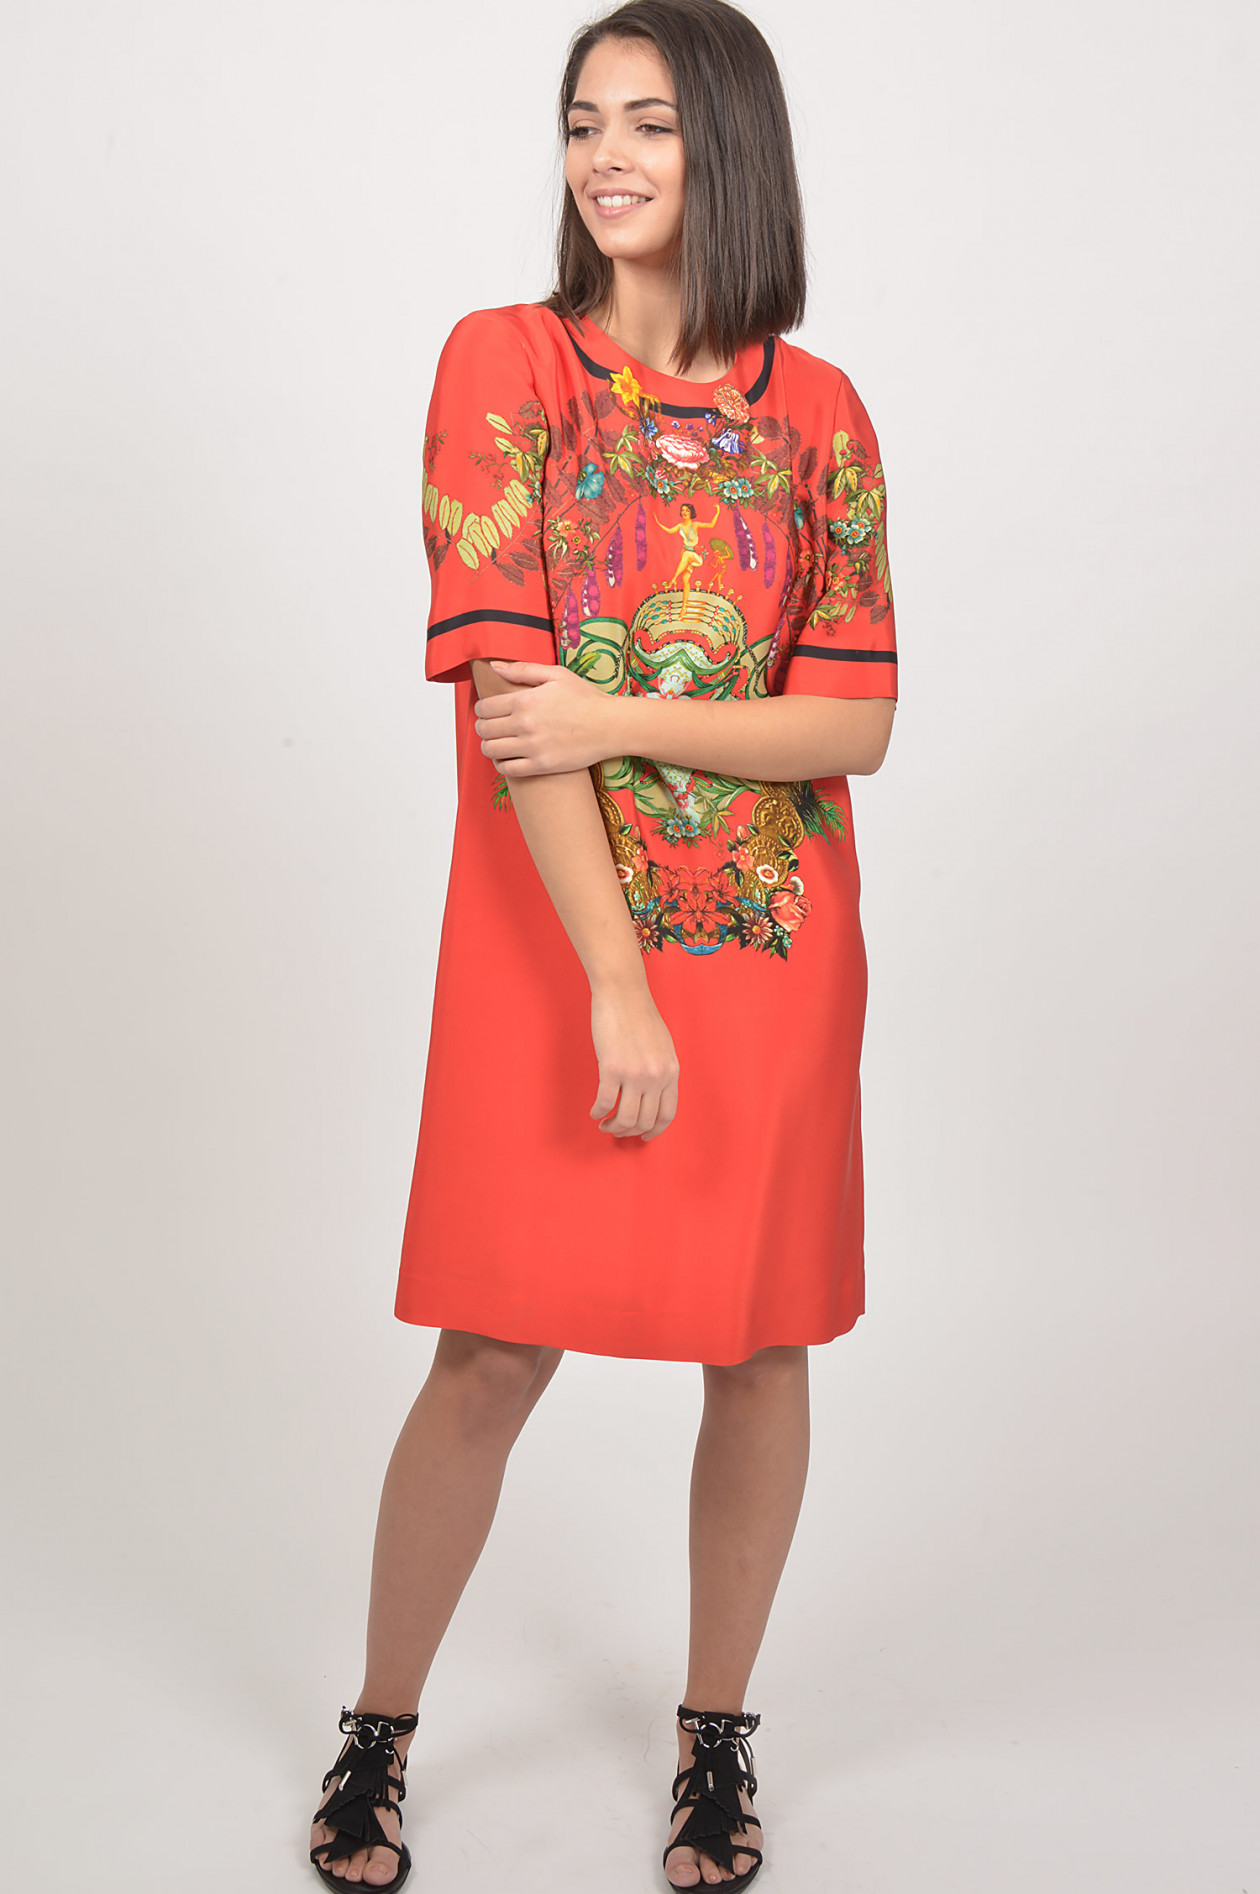 Etro Kleid In Rot Grun Gemustert Gruener At